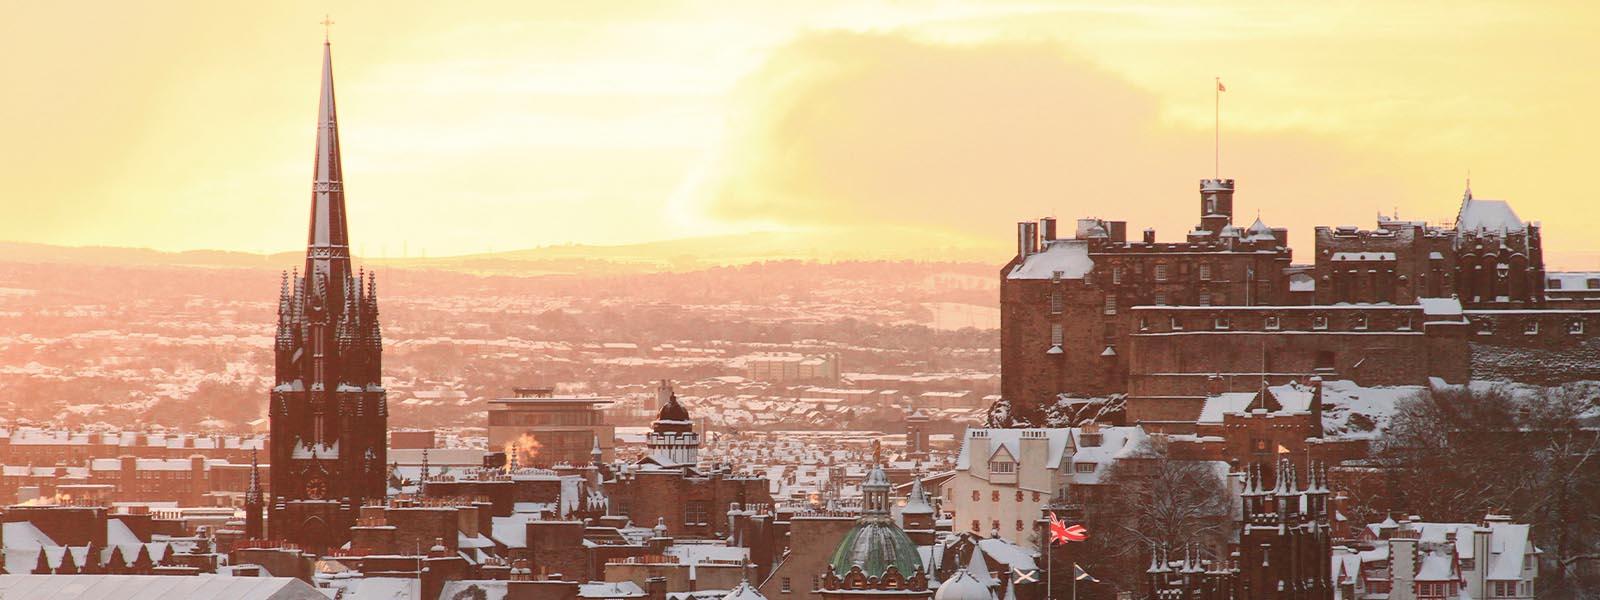 Edinburgh rooftops in a snowy winter